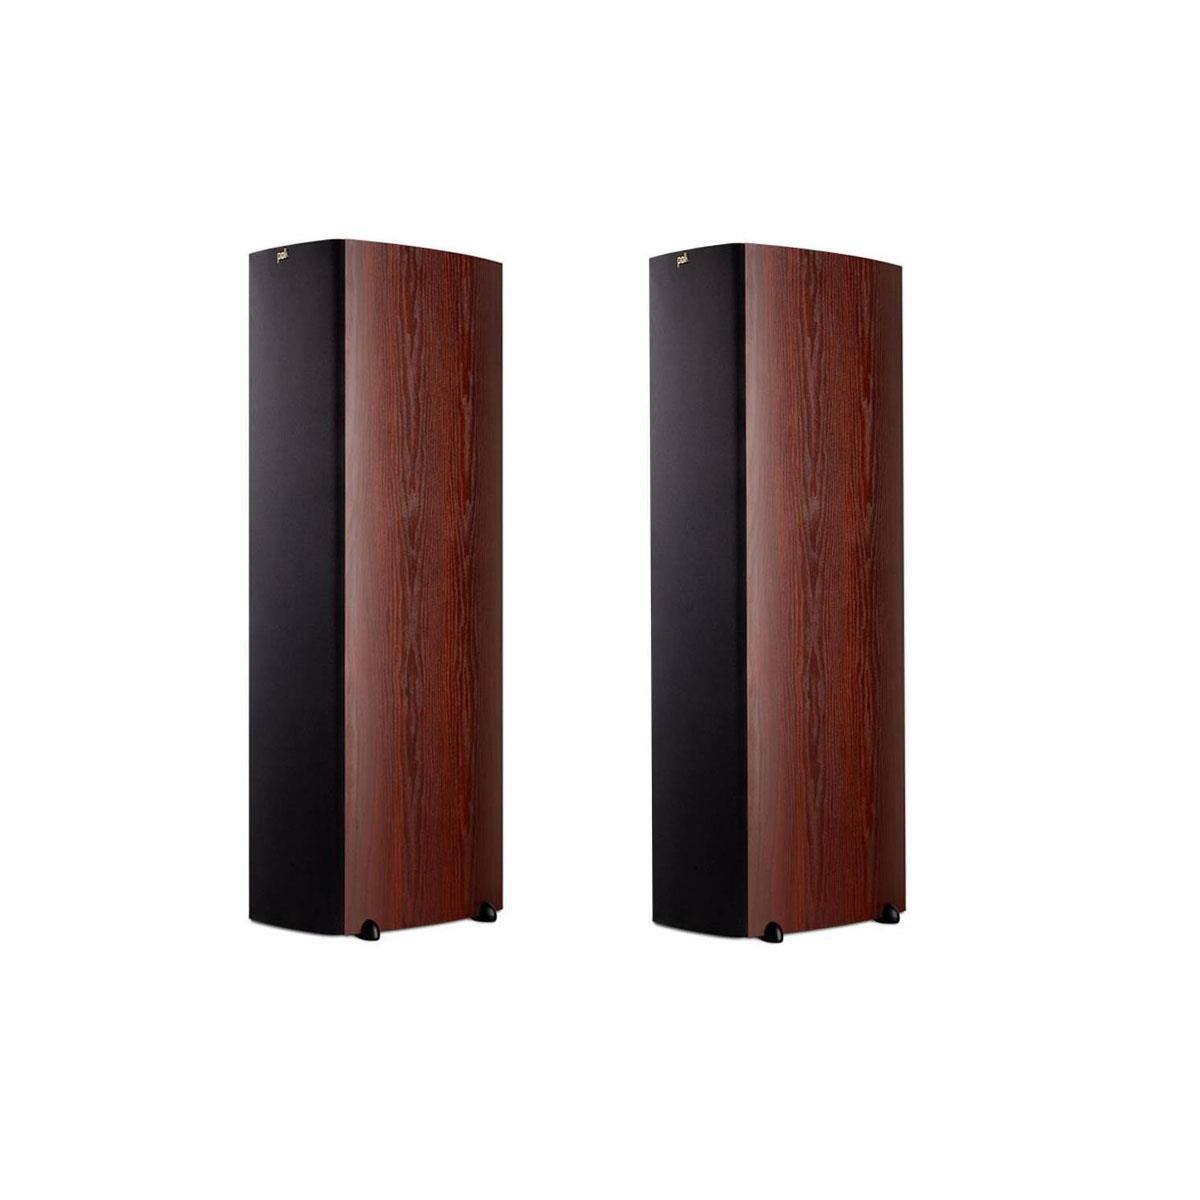 Polk Audio Speakers: (pair) of TSx550T Floorstanding Speakers $499 or (pair) TSx550T + TSx250C Center Speaker $630 + free shipping